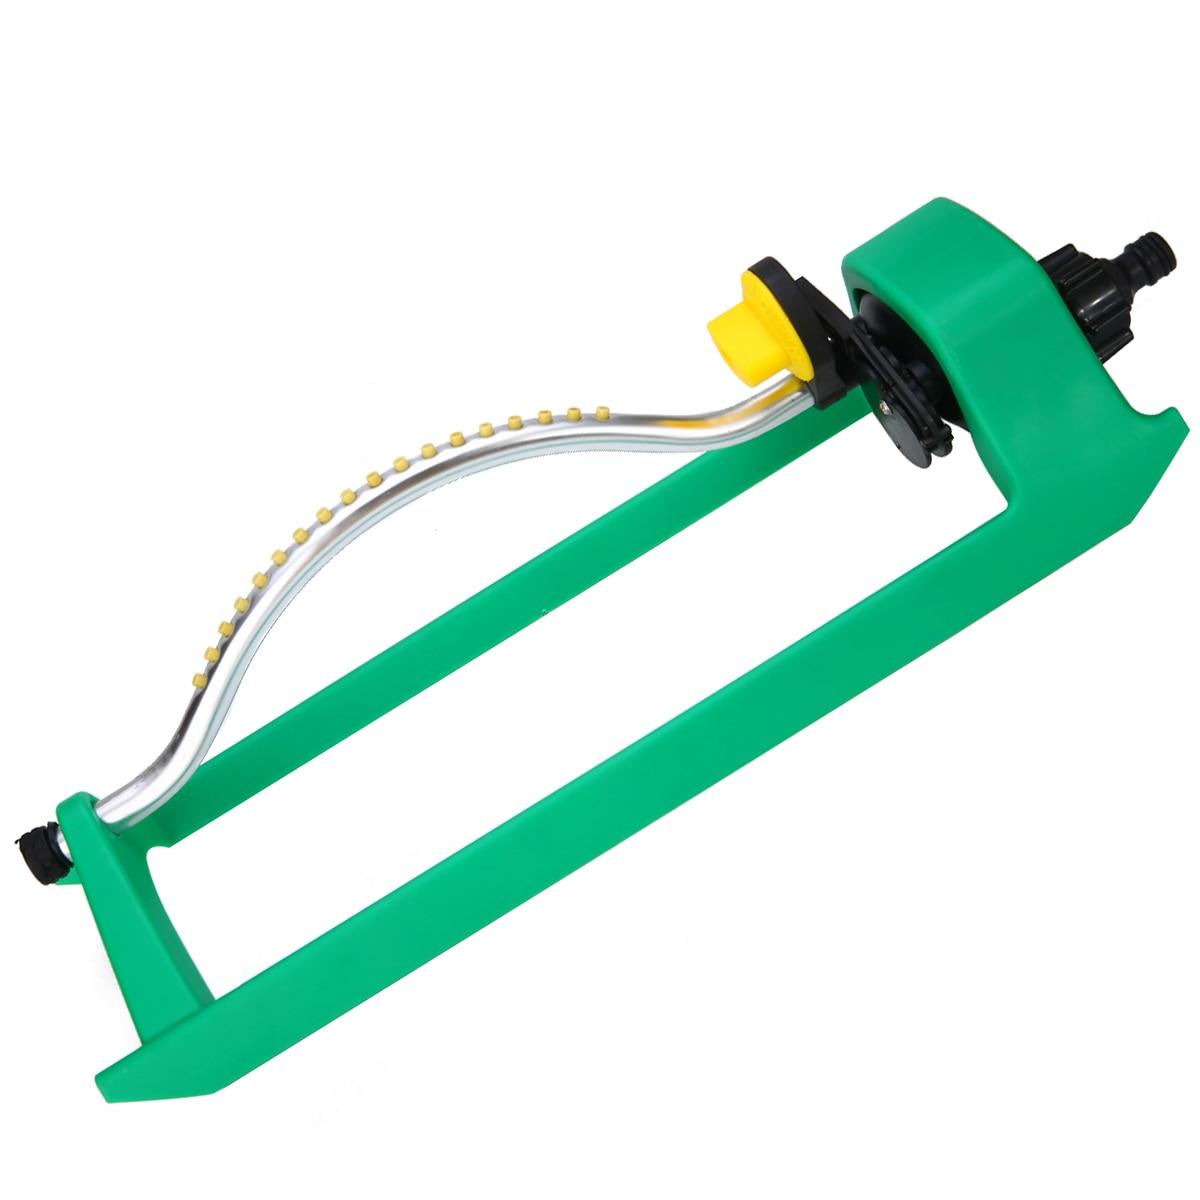 Image 2 - 18Jets Oscillating Lawn Water Sprinkler Watering Garden Pipe Hose Water Flow-in Garden Sprinklers from Home & Garden